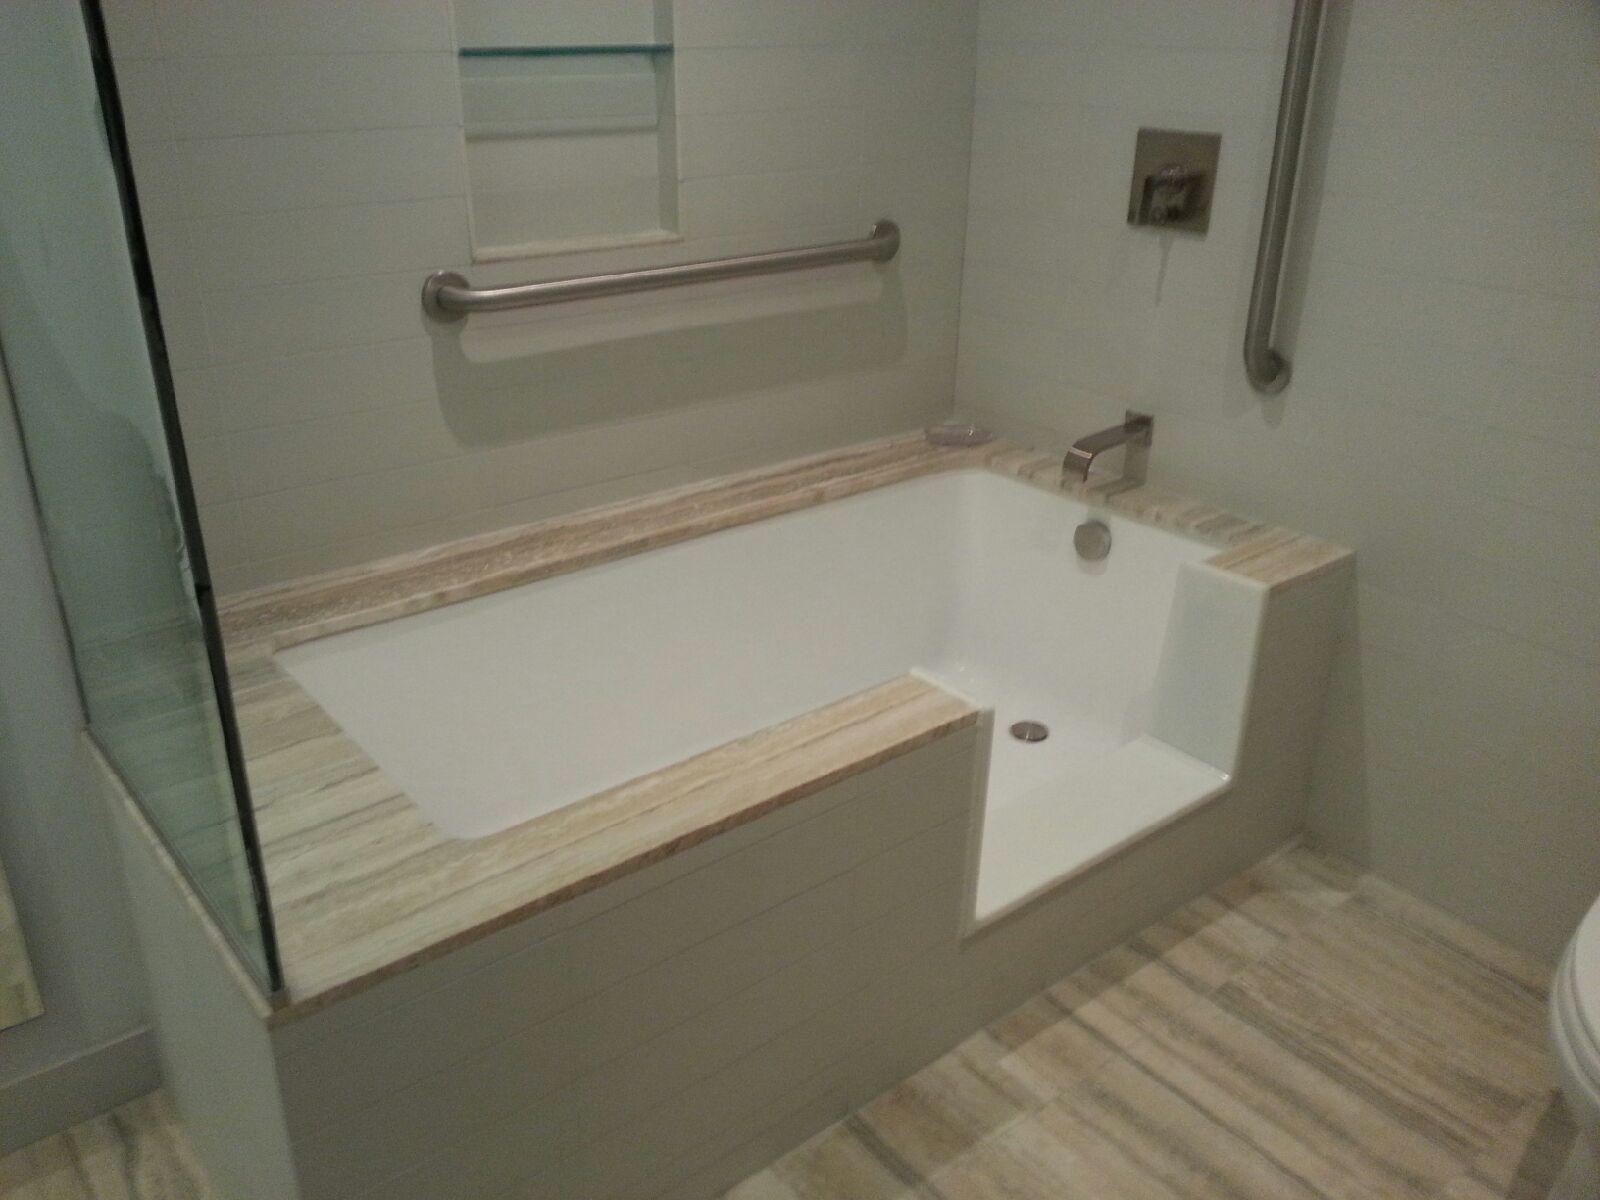 Tub Cuts - Bathe Safe Tub Cuts